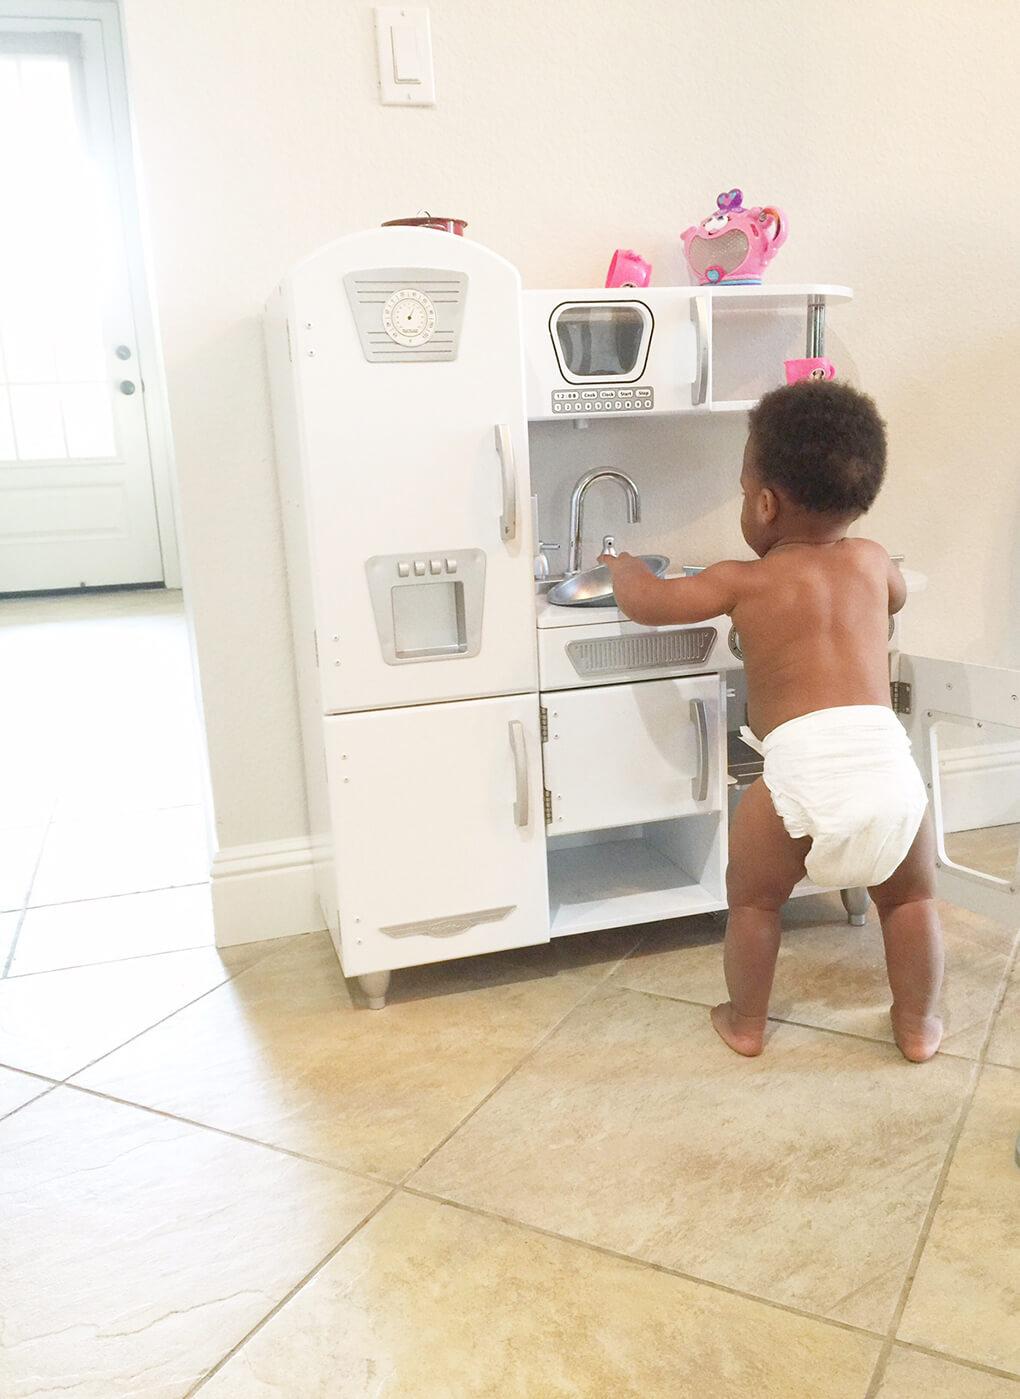 Dear Isaiah sarahkayhoffman.com Foster to Adoption on Gotcha Day